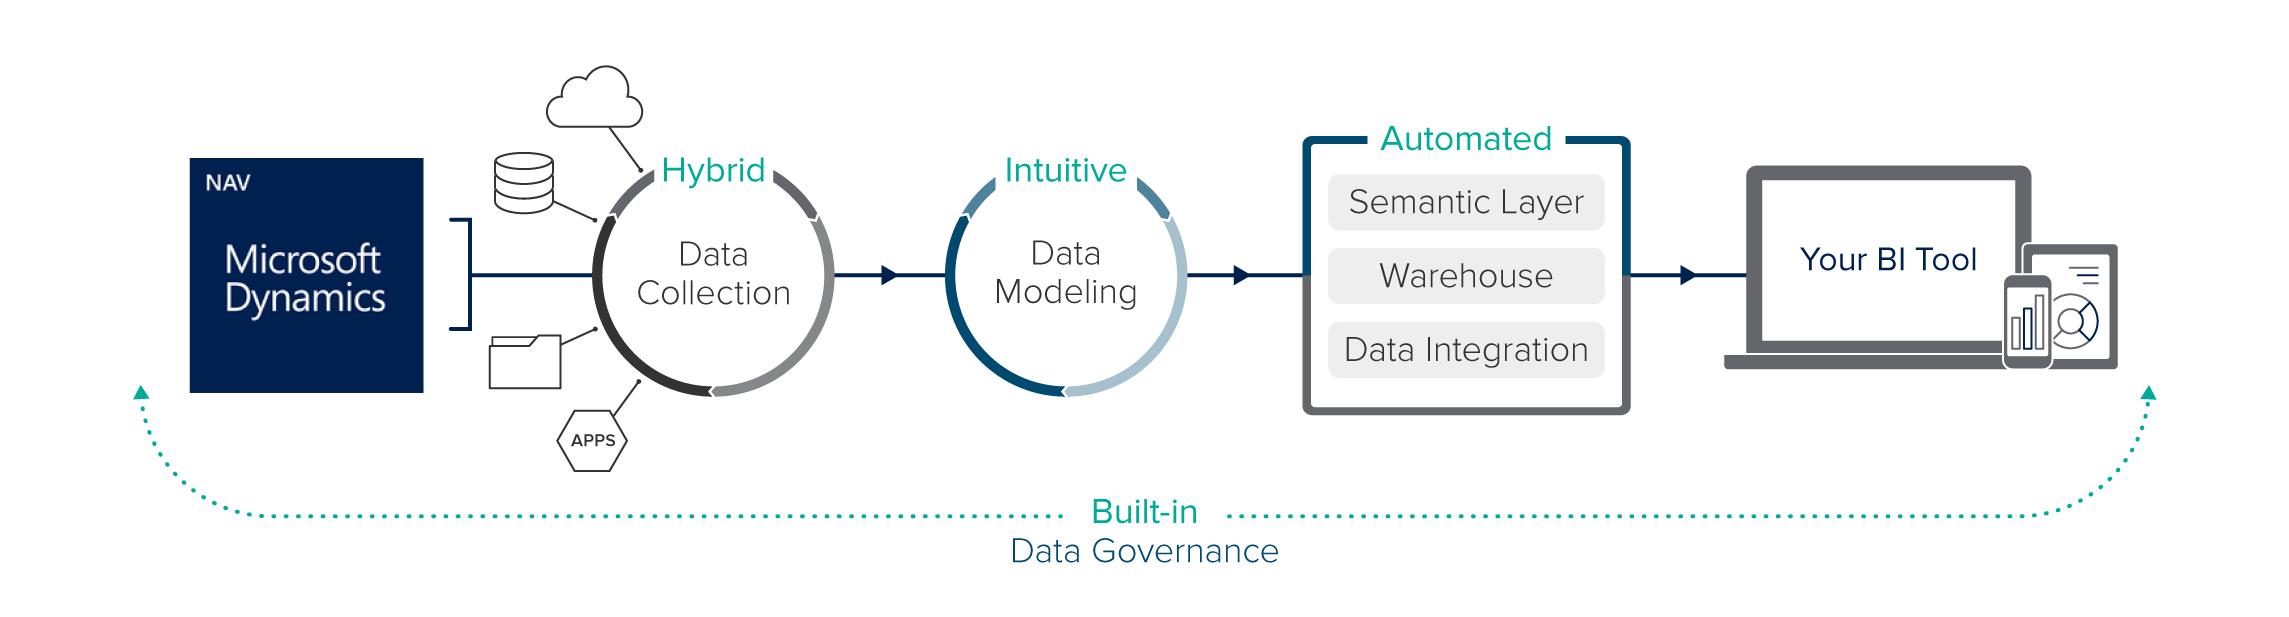 Dynamics nav data management and bi zap zap data management for microsoft dynamics nav 1betcityfo Images